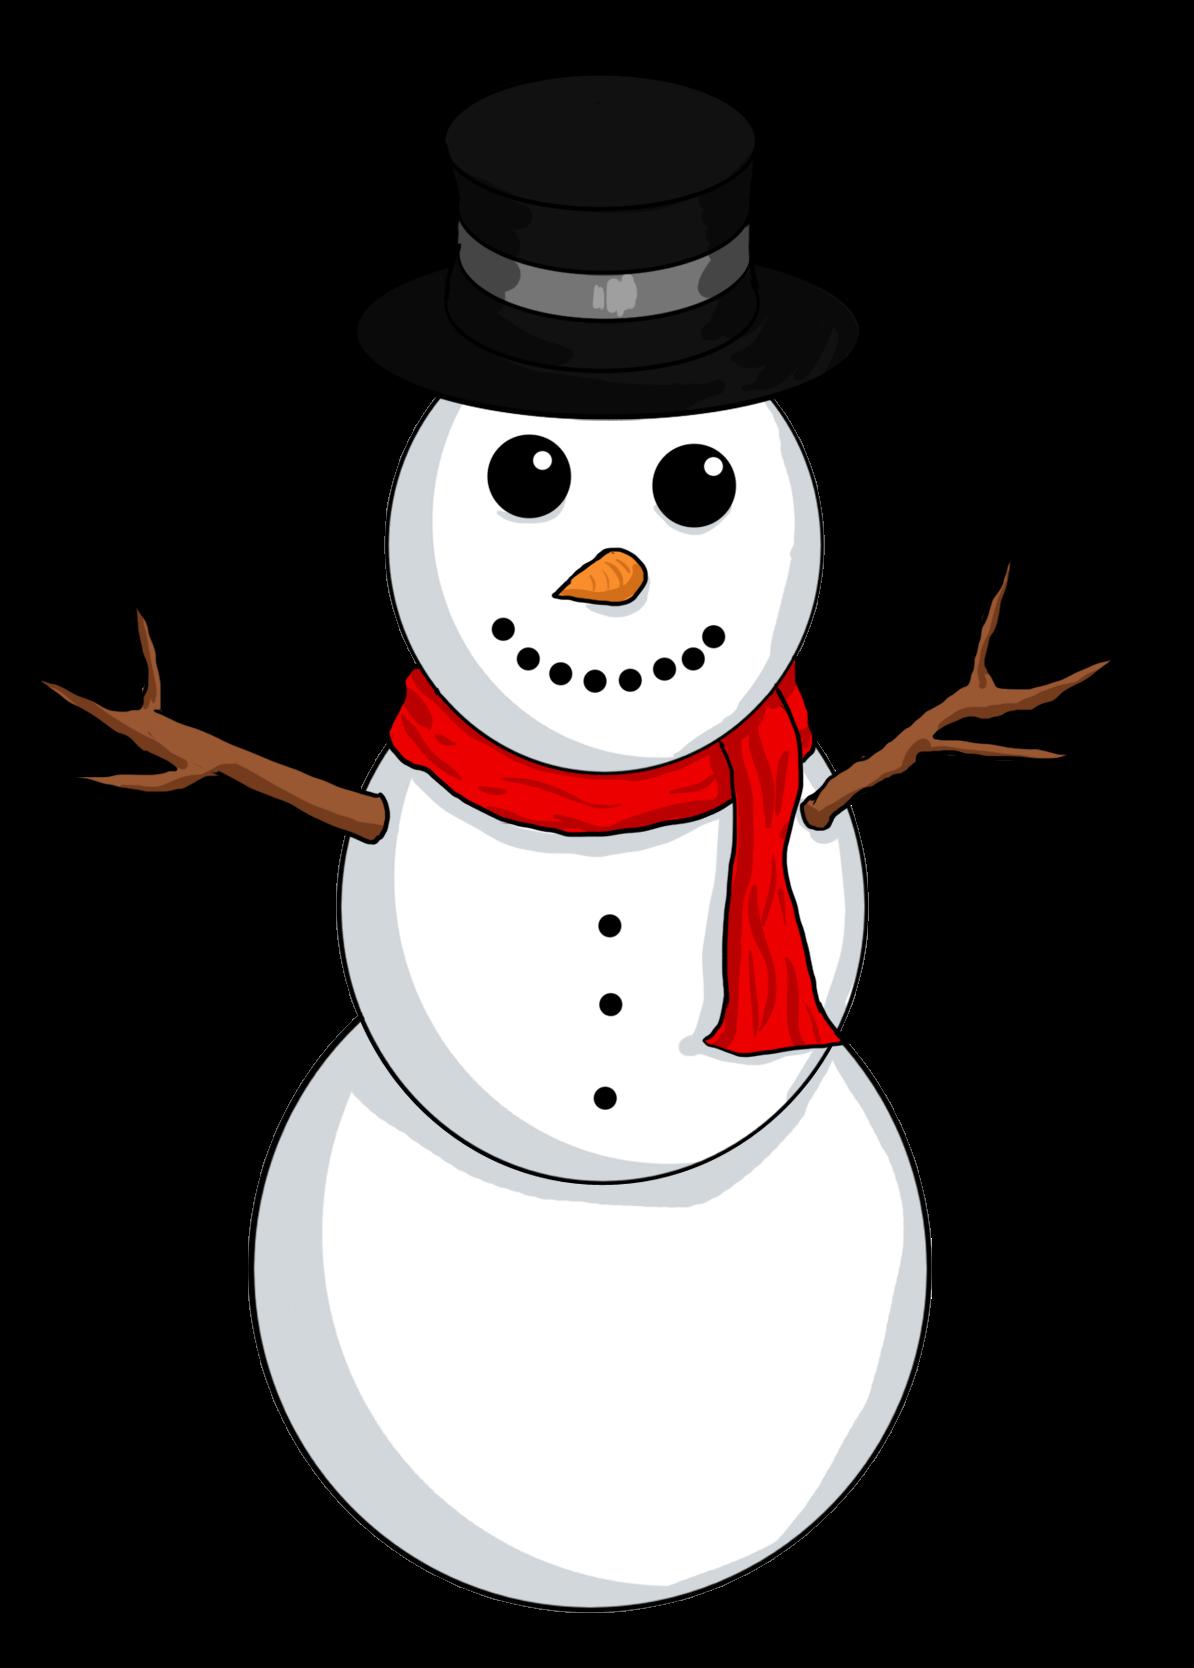 Snowman Clipart Free Illustration Image-Snowman clipart free illustration image-14